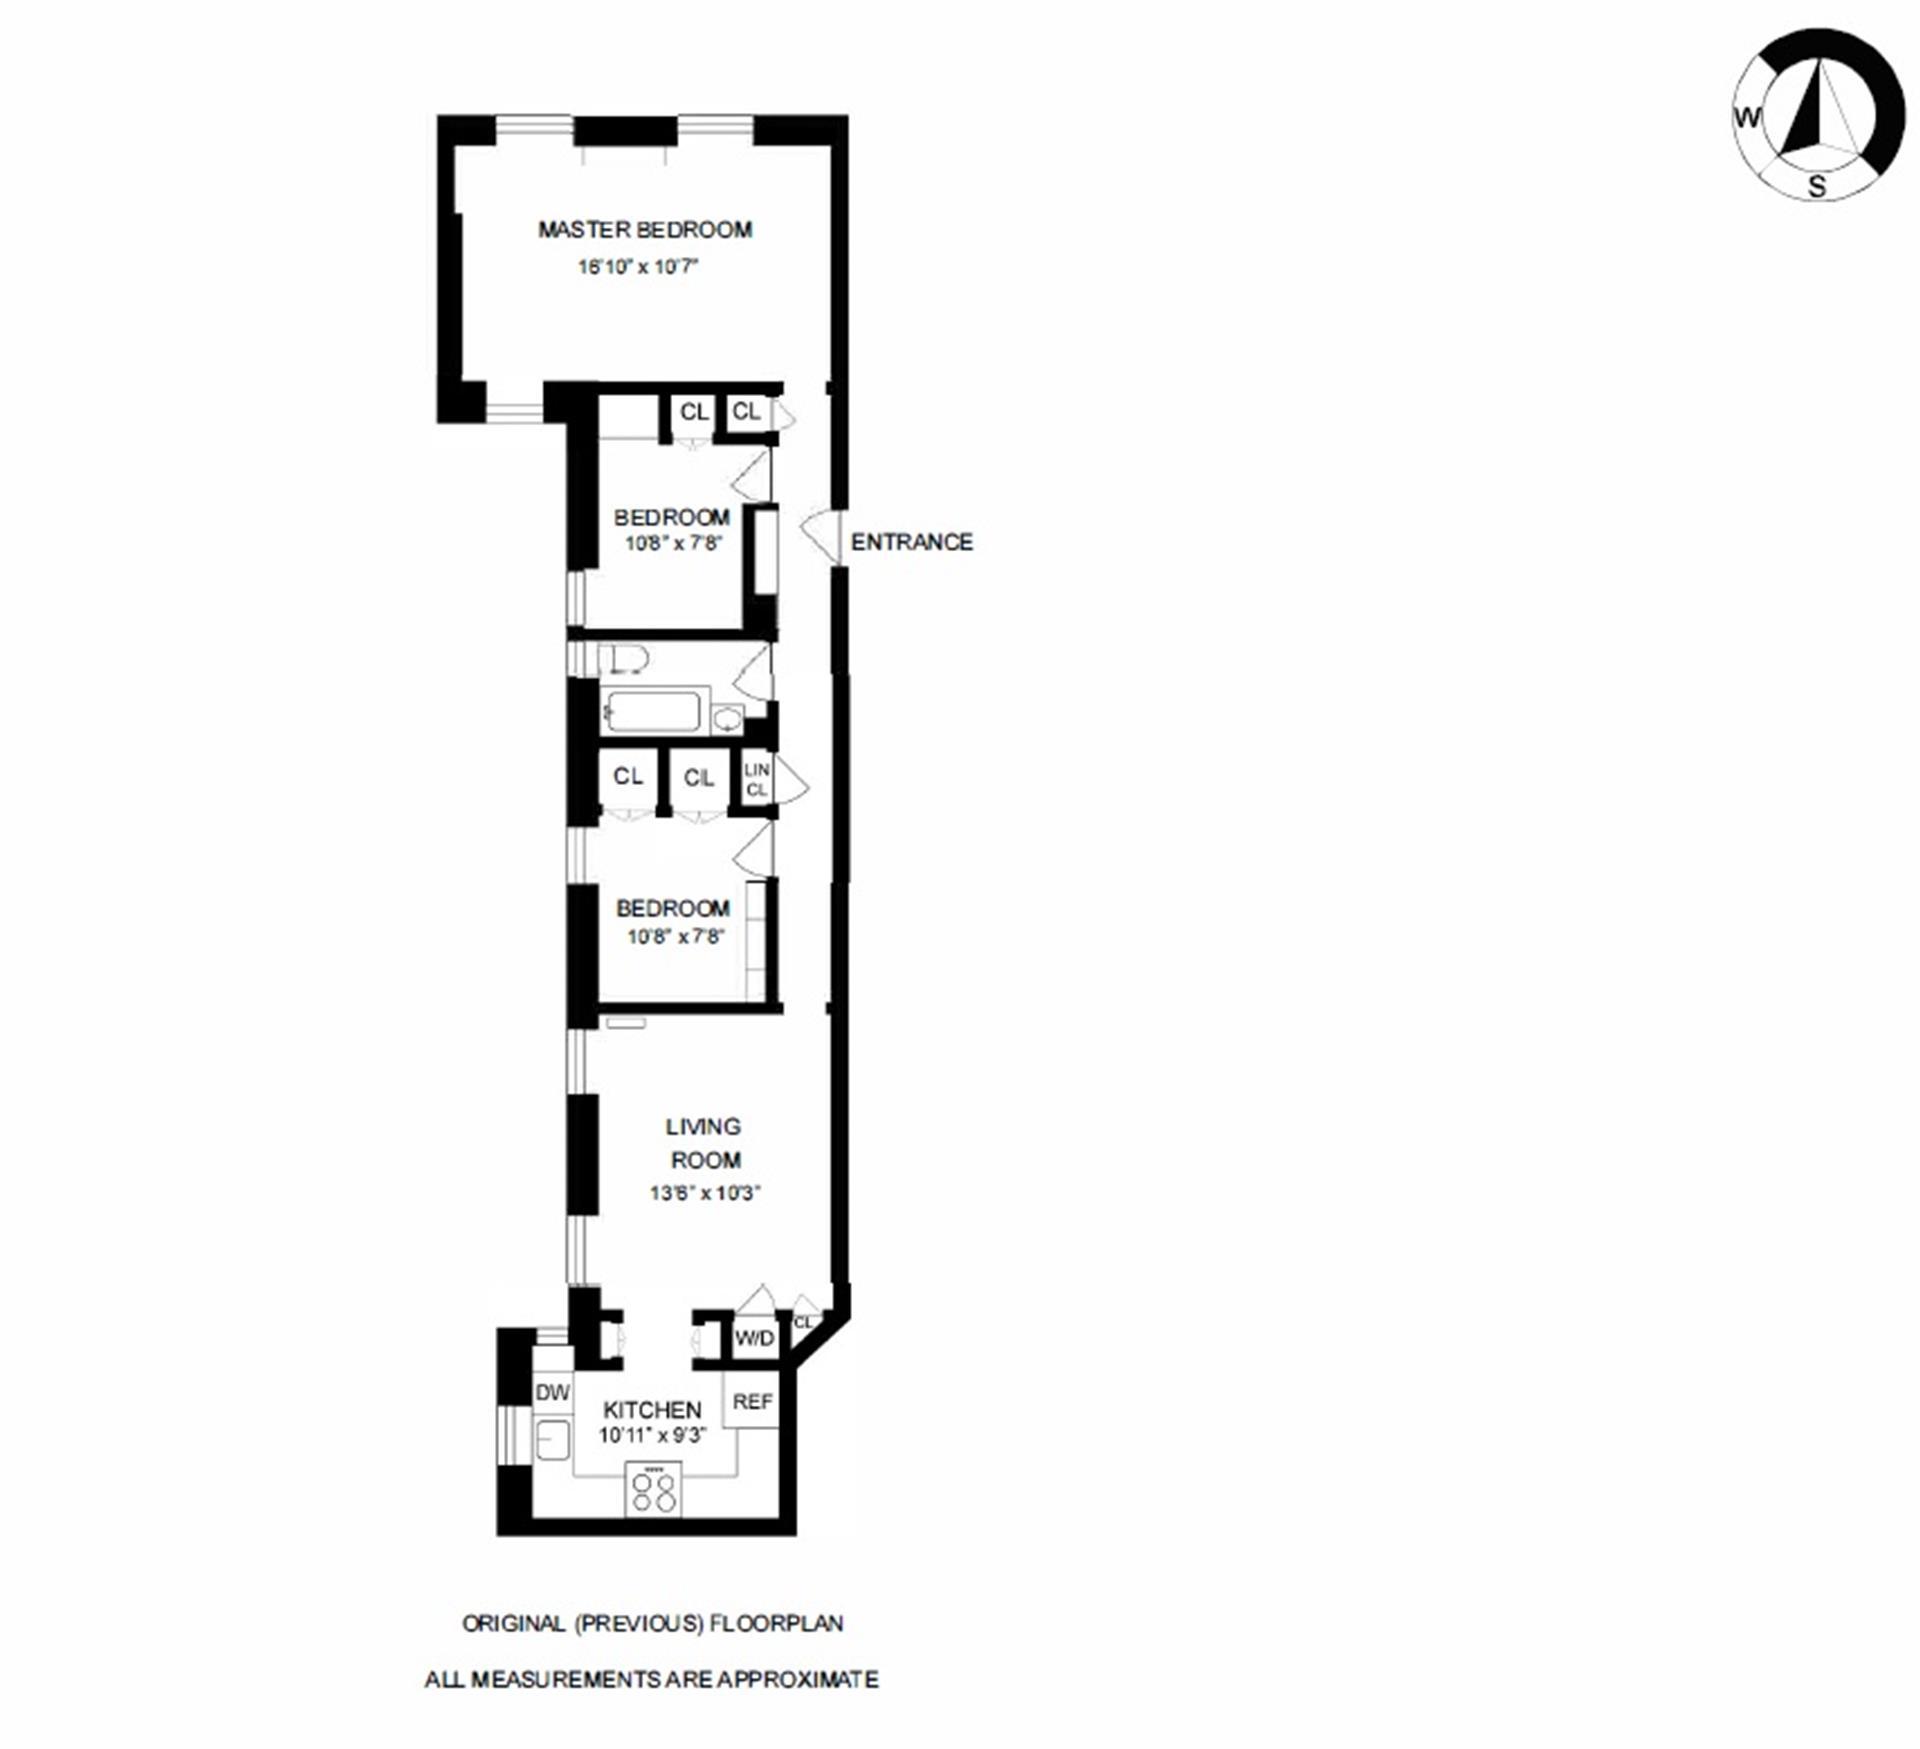 Floor plan of The Unadilla, 126 West 11th St, 2 - Greenwich Village, New York